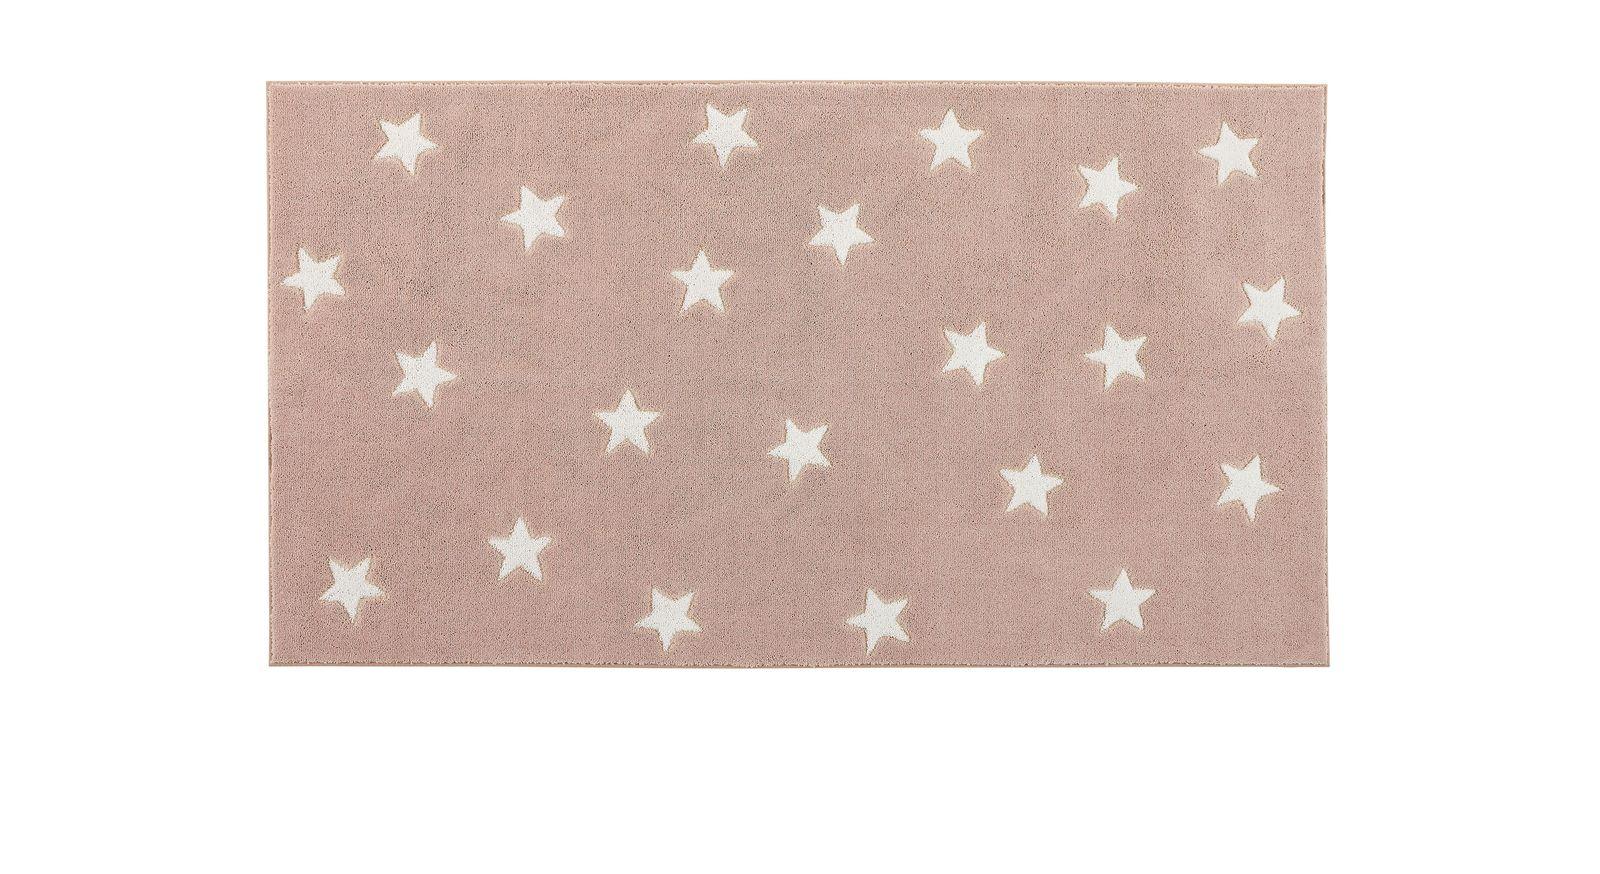 LIFEETIME Teppich Sterne in der Farbe rosa